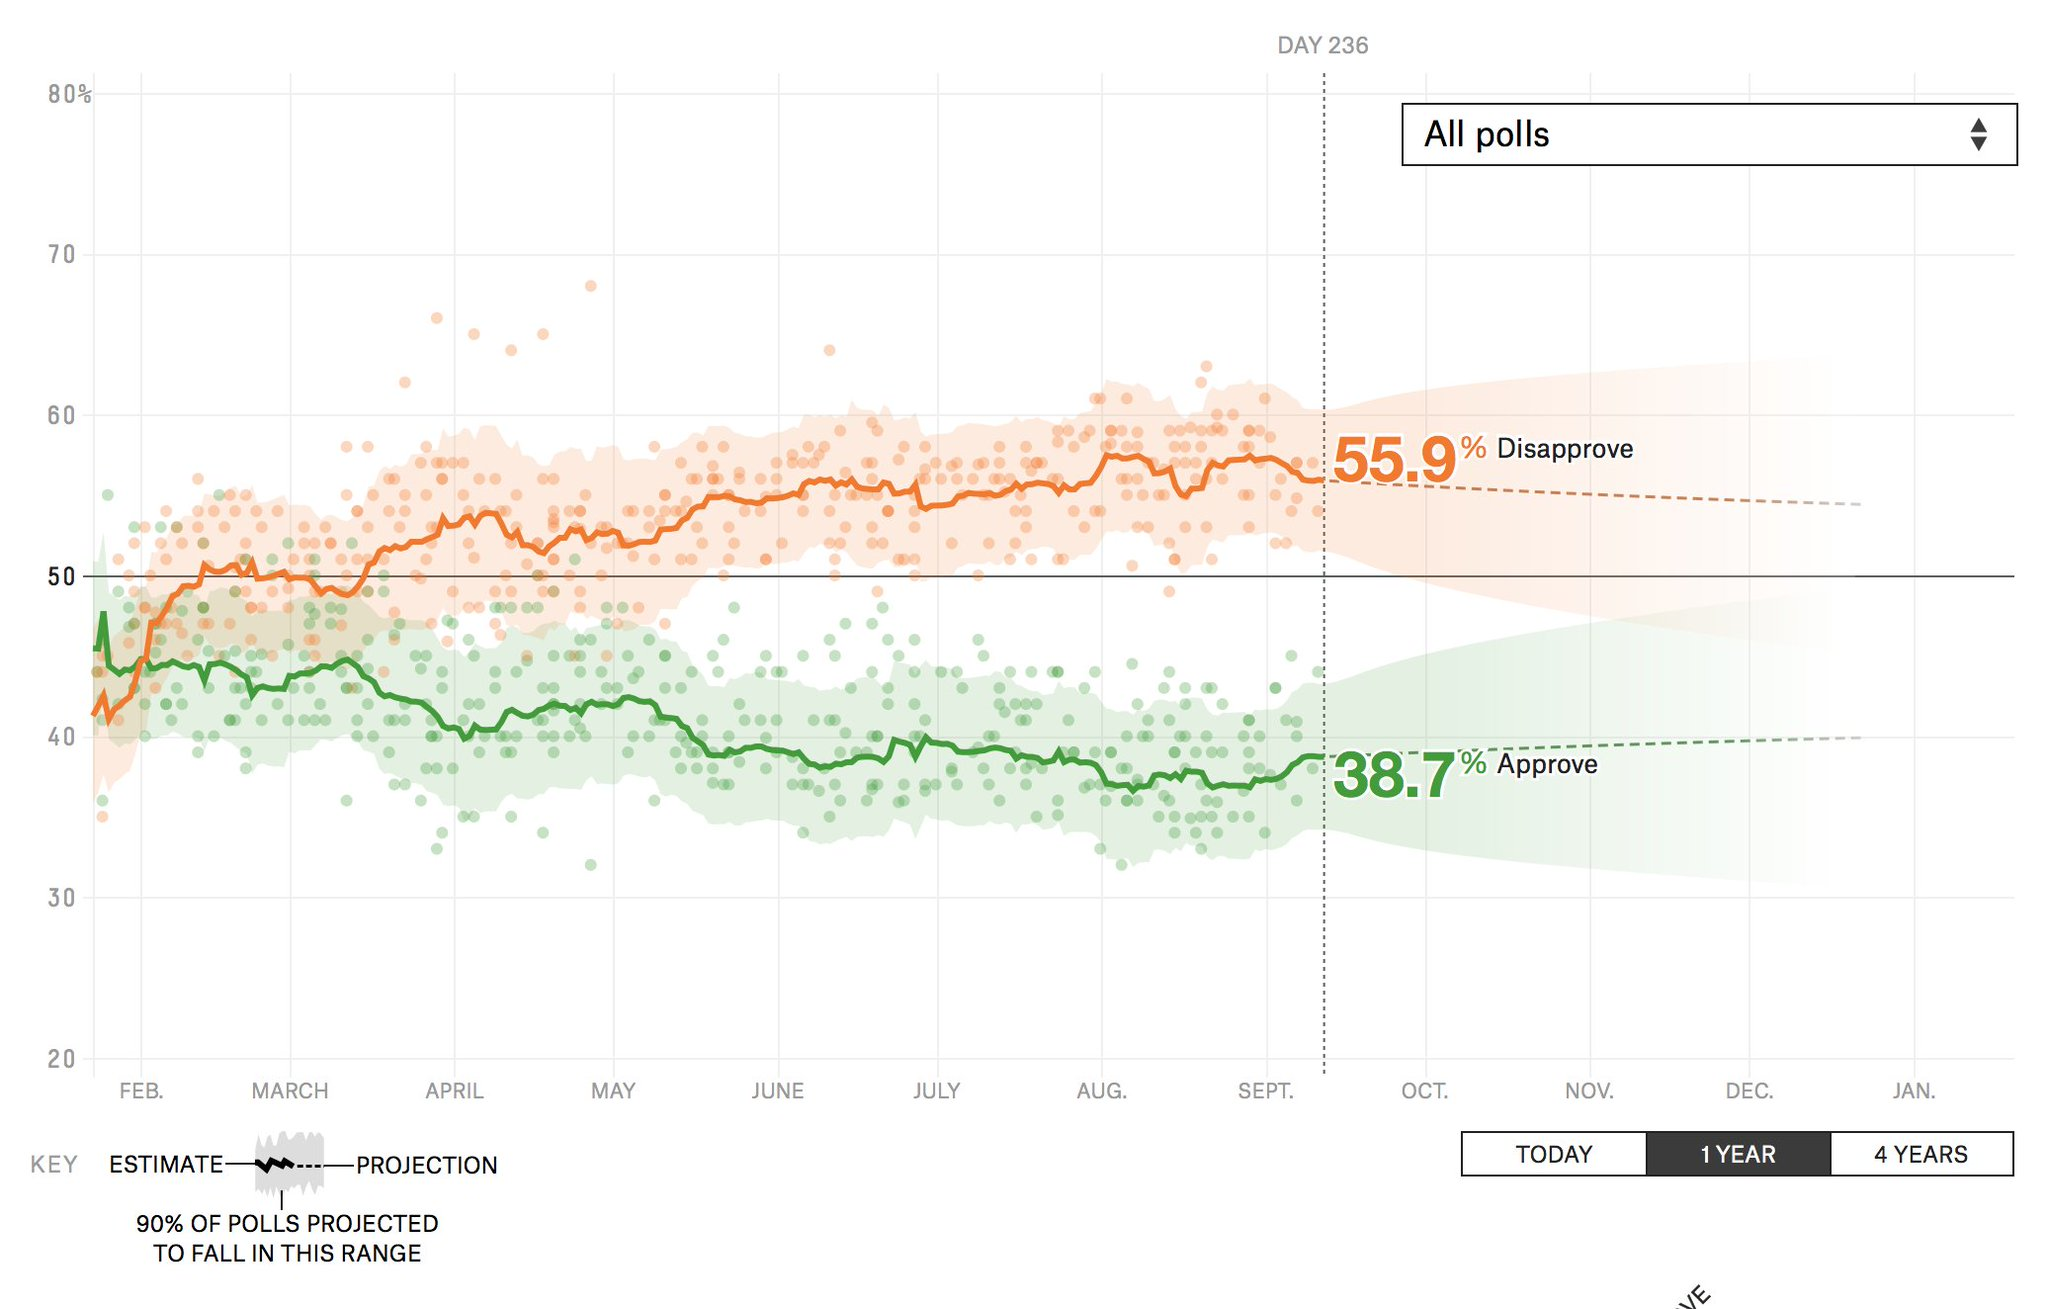 President Donald Trump has a 38.7% approval rating. https://t.co/vxA46w6lOe https://t.co/fmuNmQpNrZ